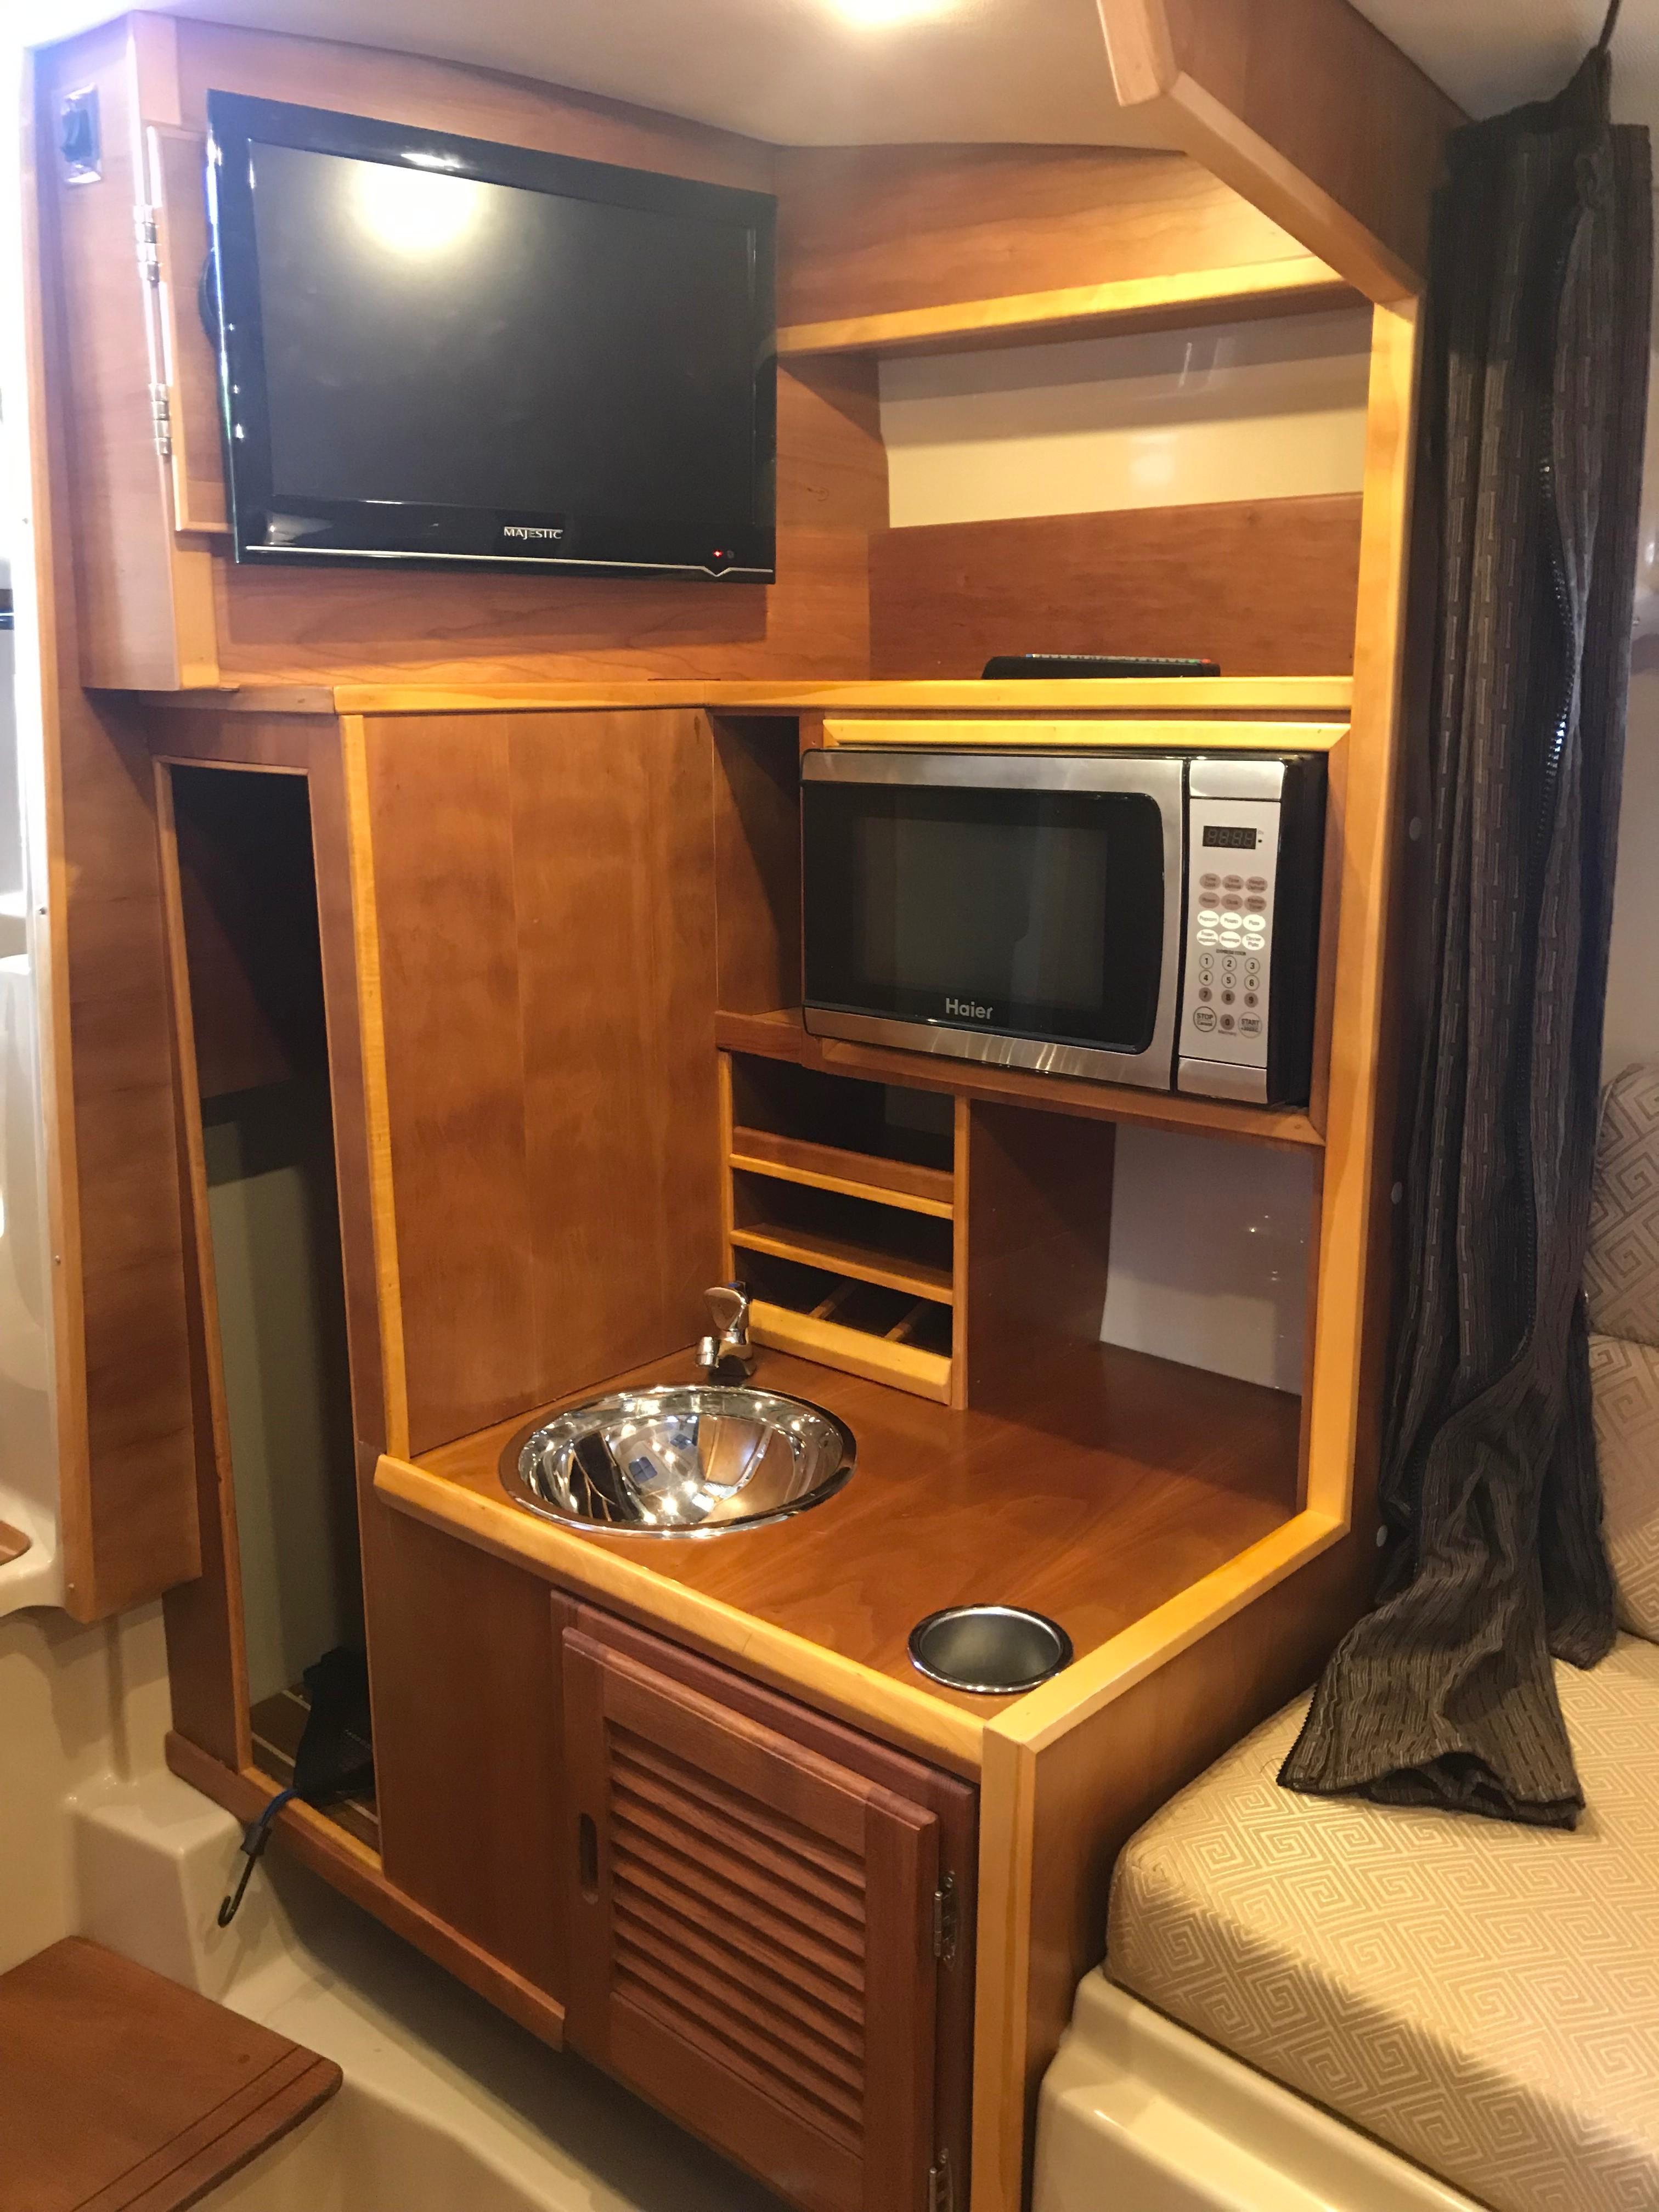 Cutwater C-28 - Vanity/TV in Forward Stateroom